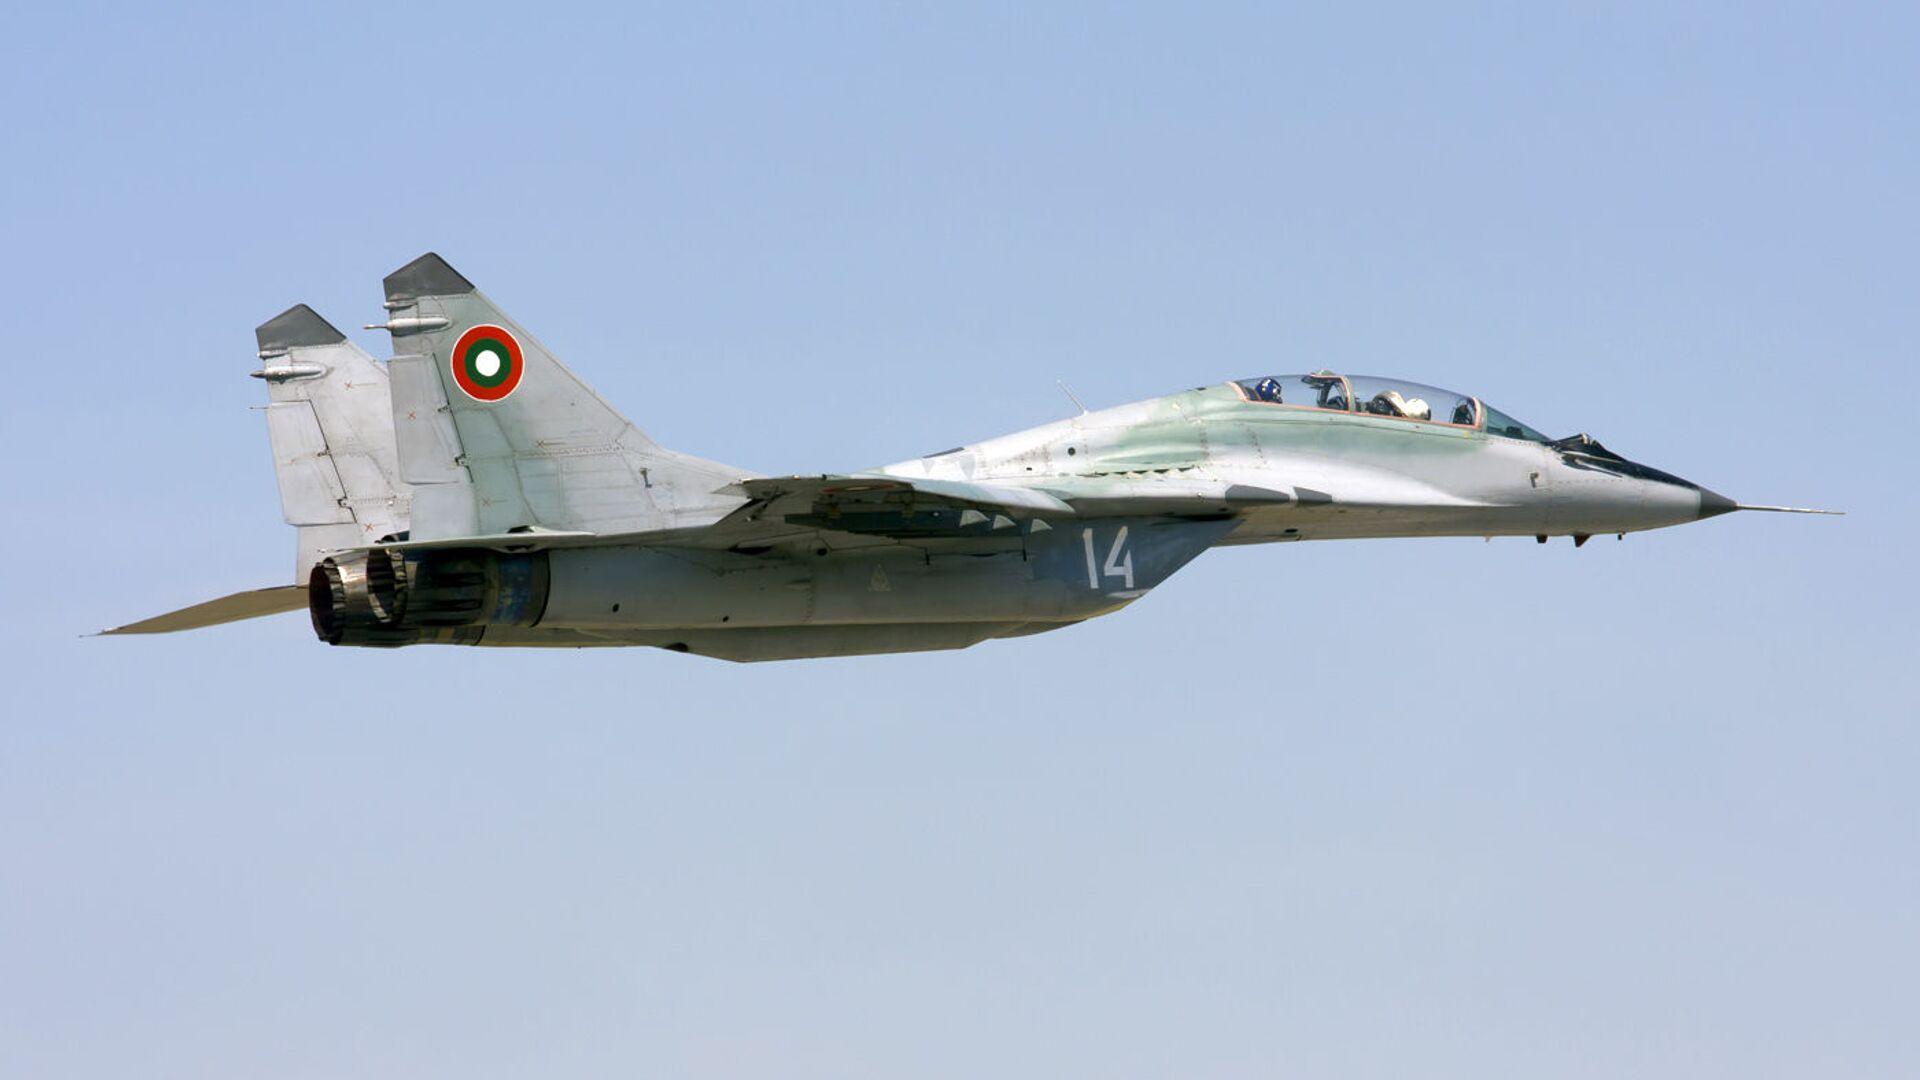 Ловац МиГ-29 бугарског ратног ваздухопловства - Sputnik Србија, 1920, 18.08.2021